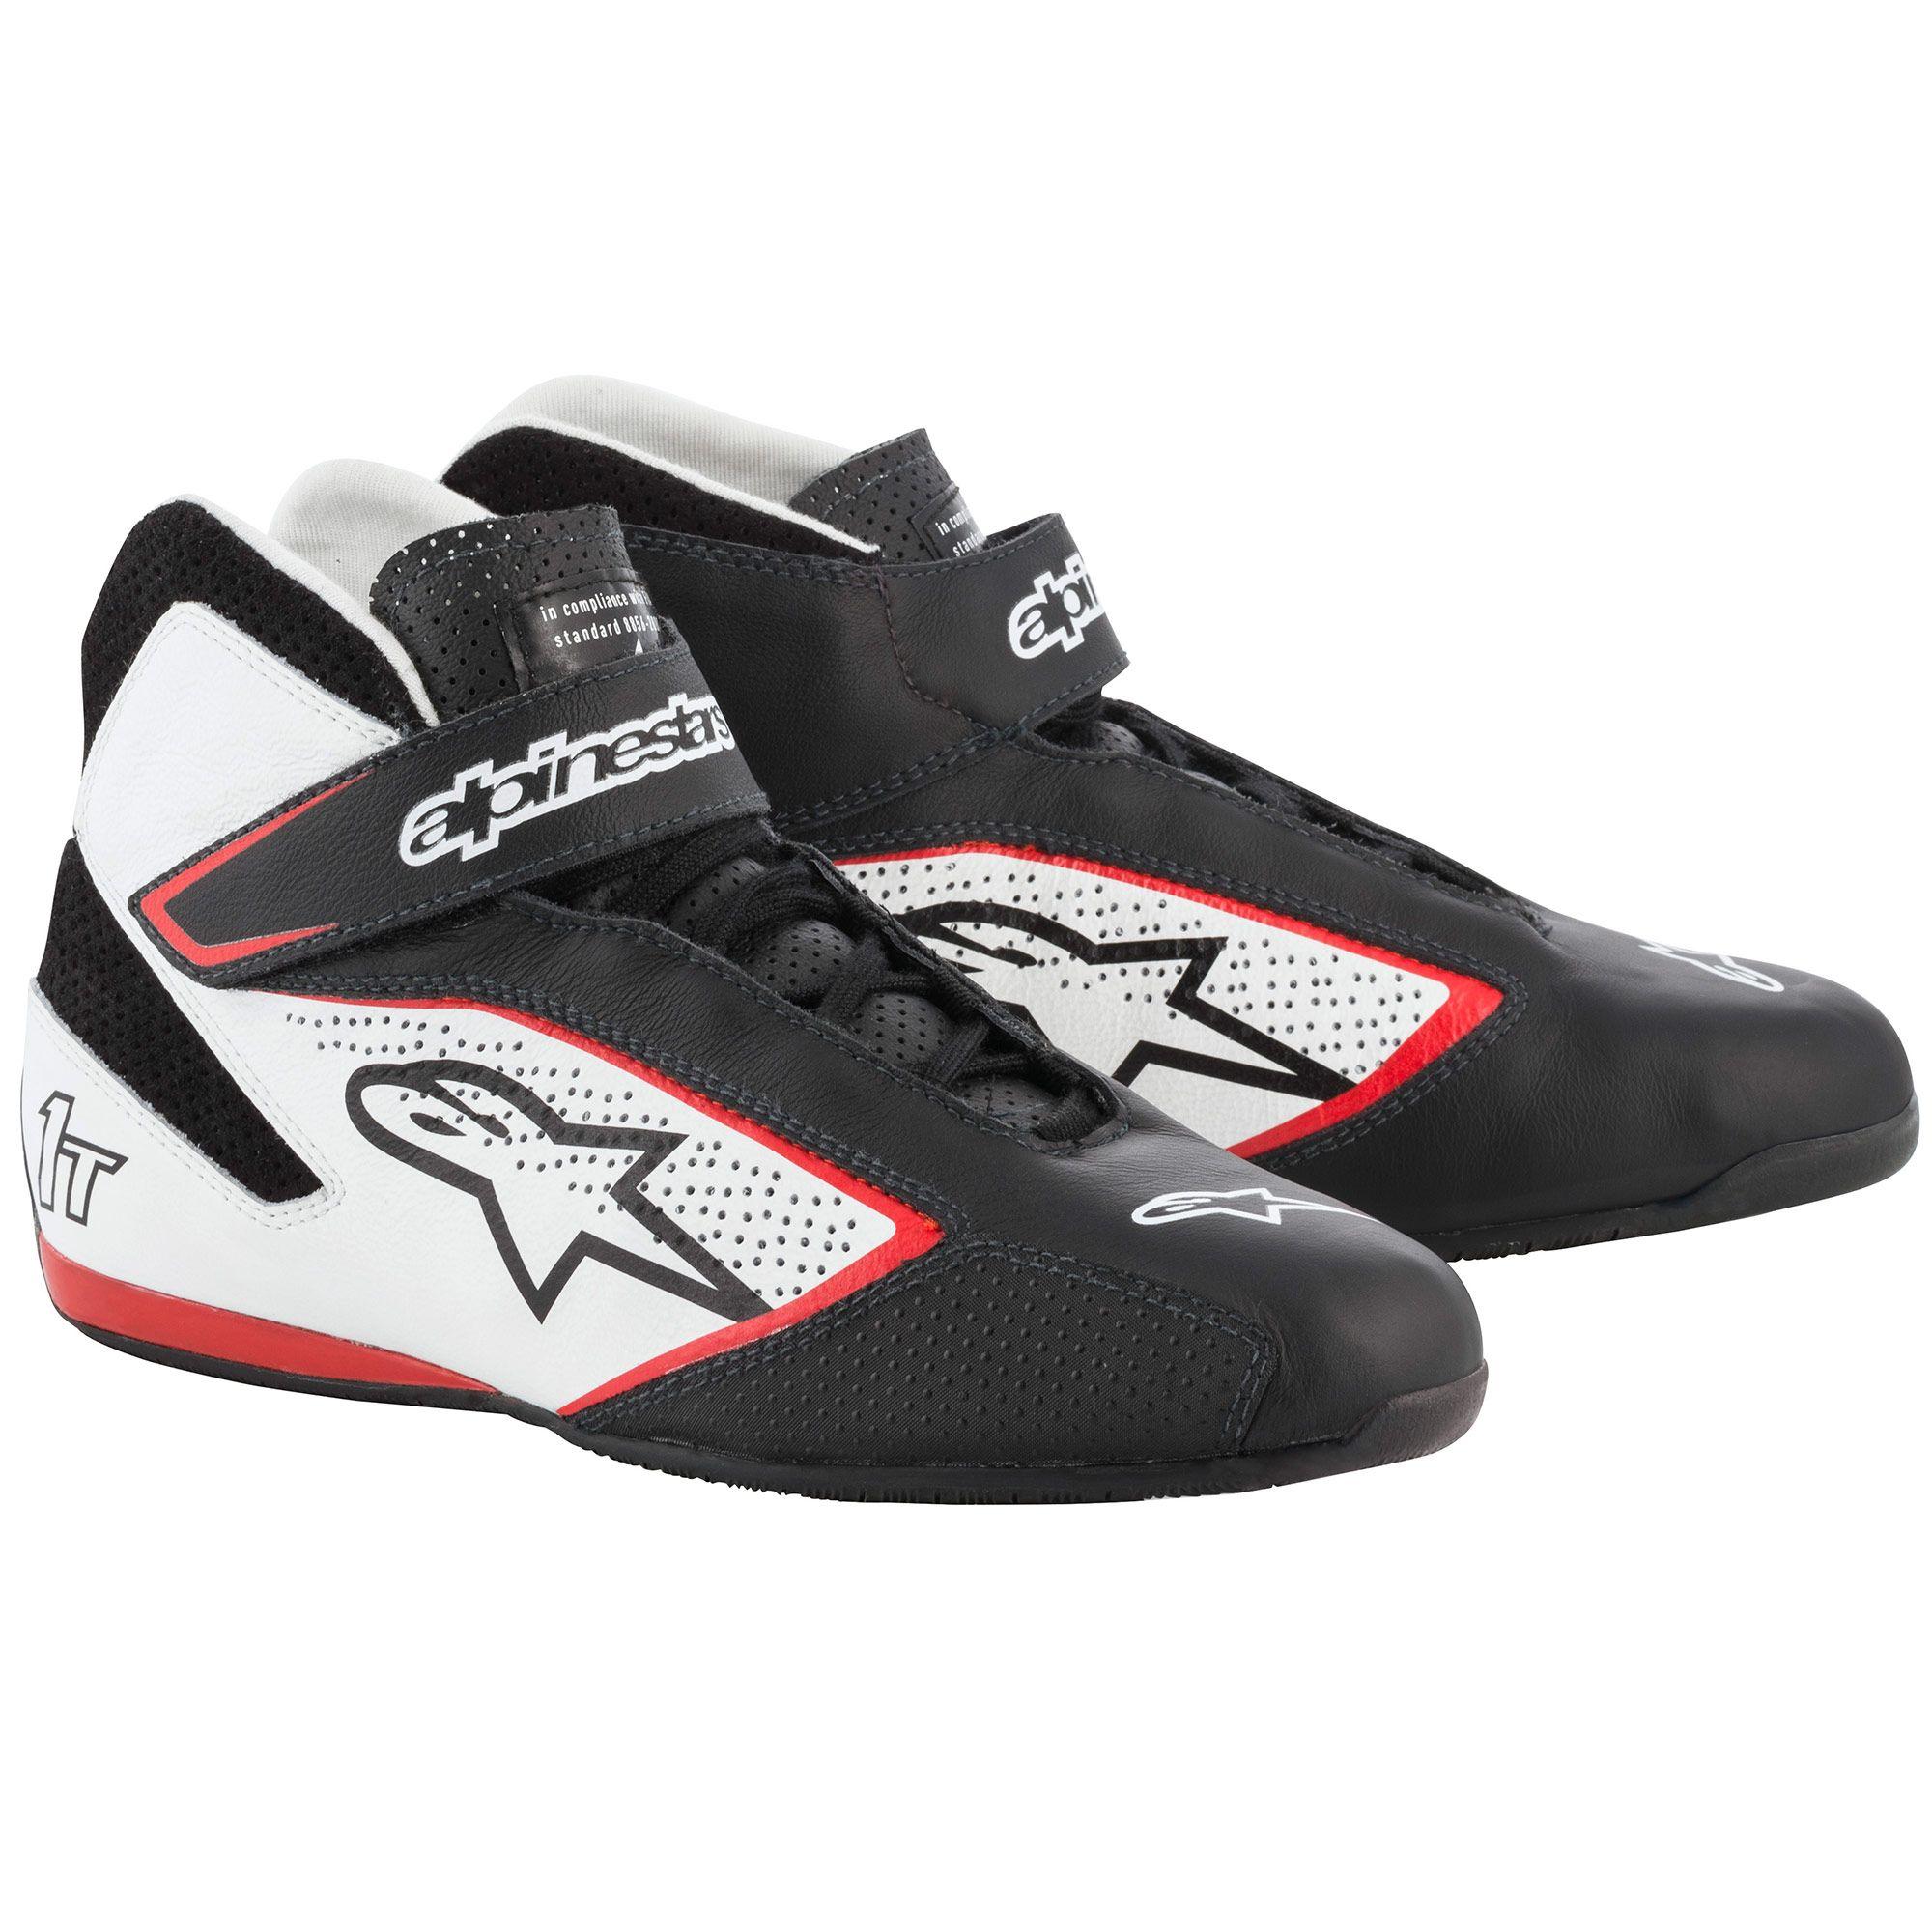 Alpinestars Tech 1-T Race Shoes